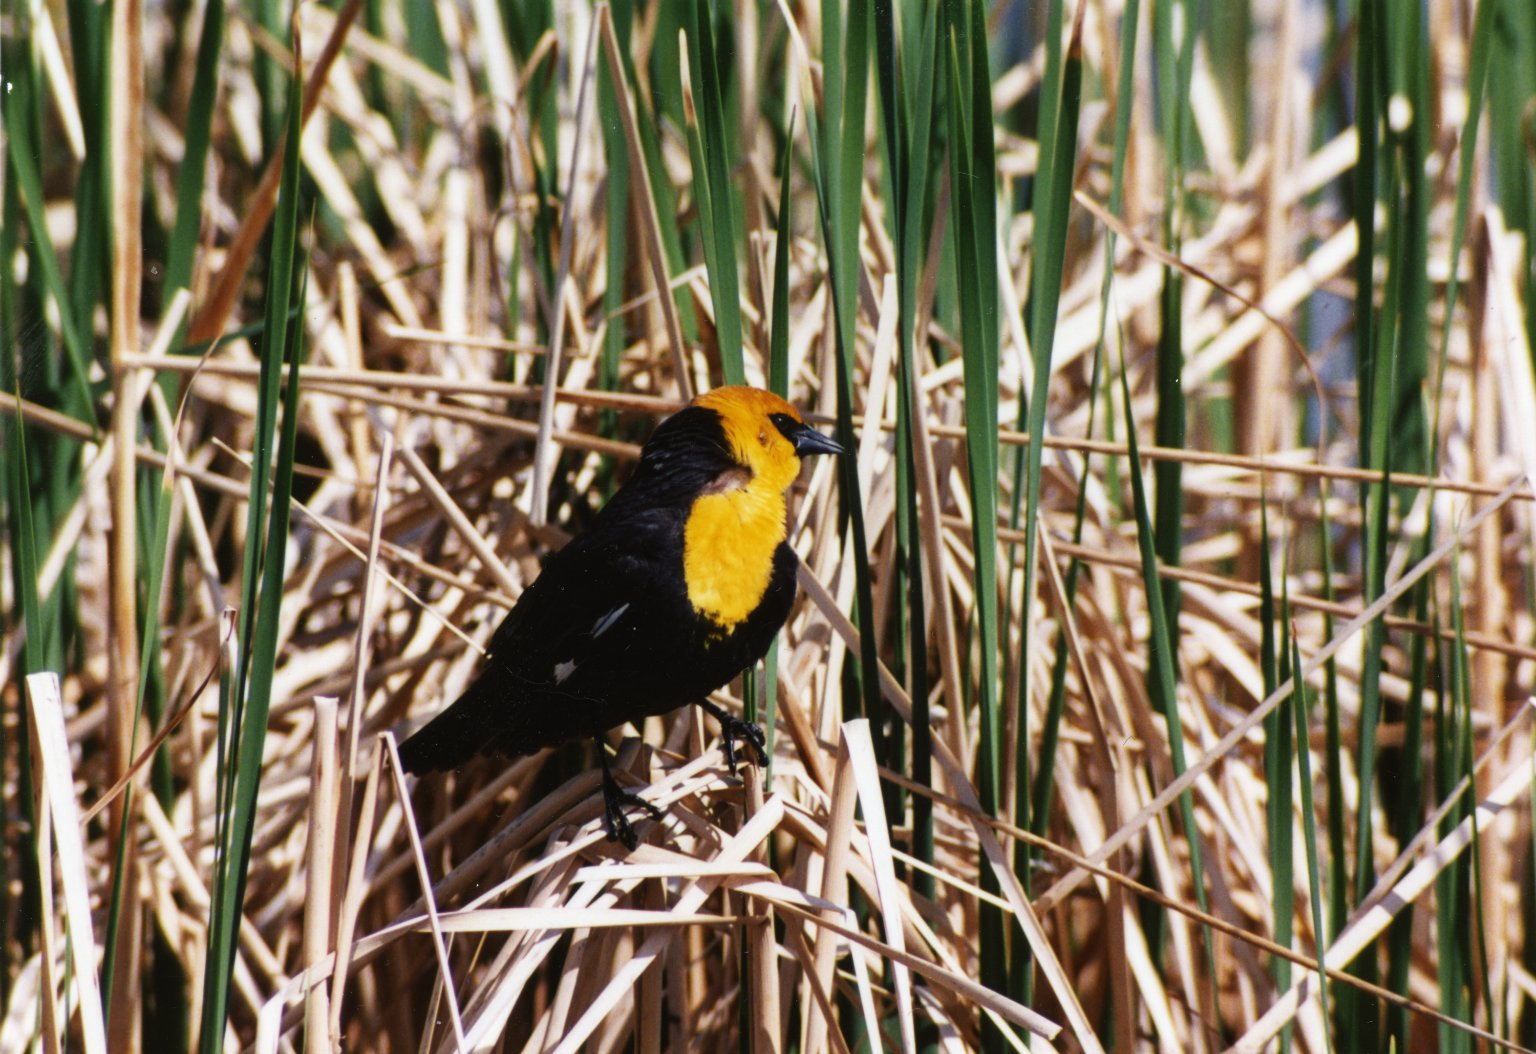 Yellow-headed blackbird sitting on grasses